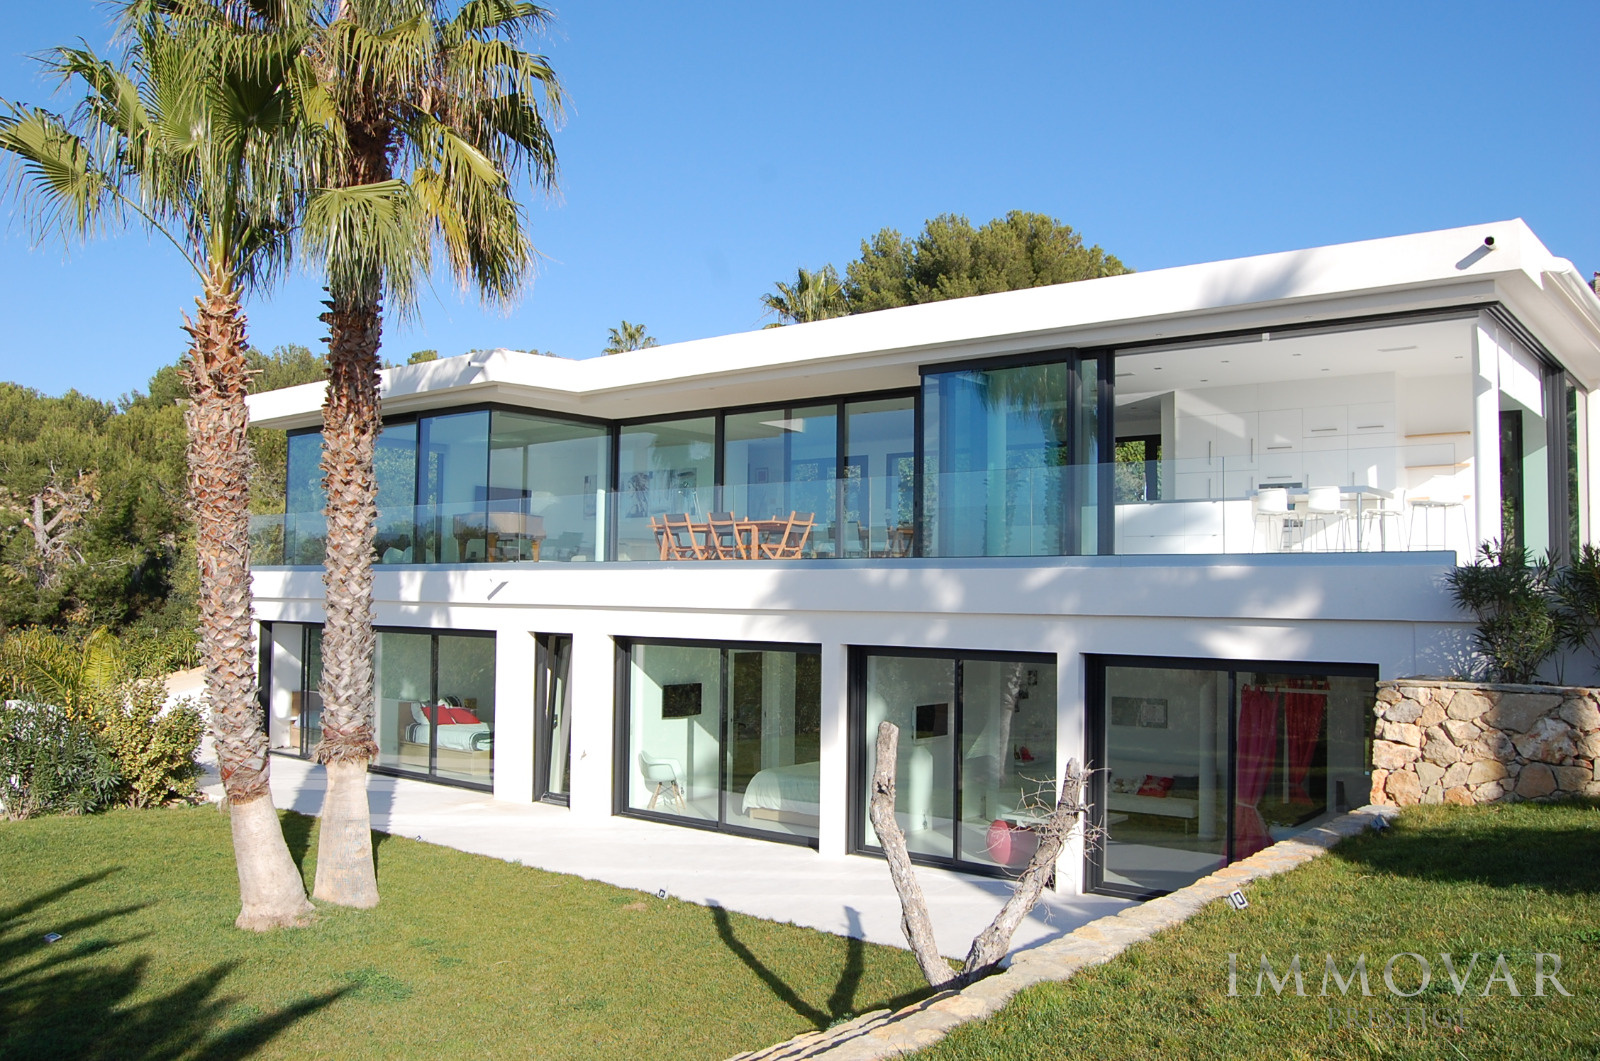 Vente villas luxe st cyr sur mer bandol sanary sur mer piscine jardin vue mer for Villa luxe mer